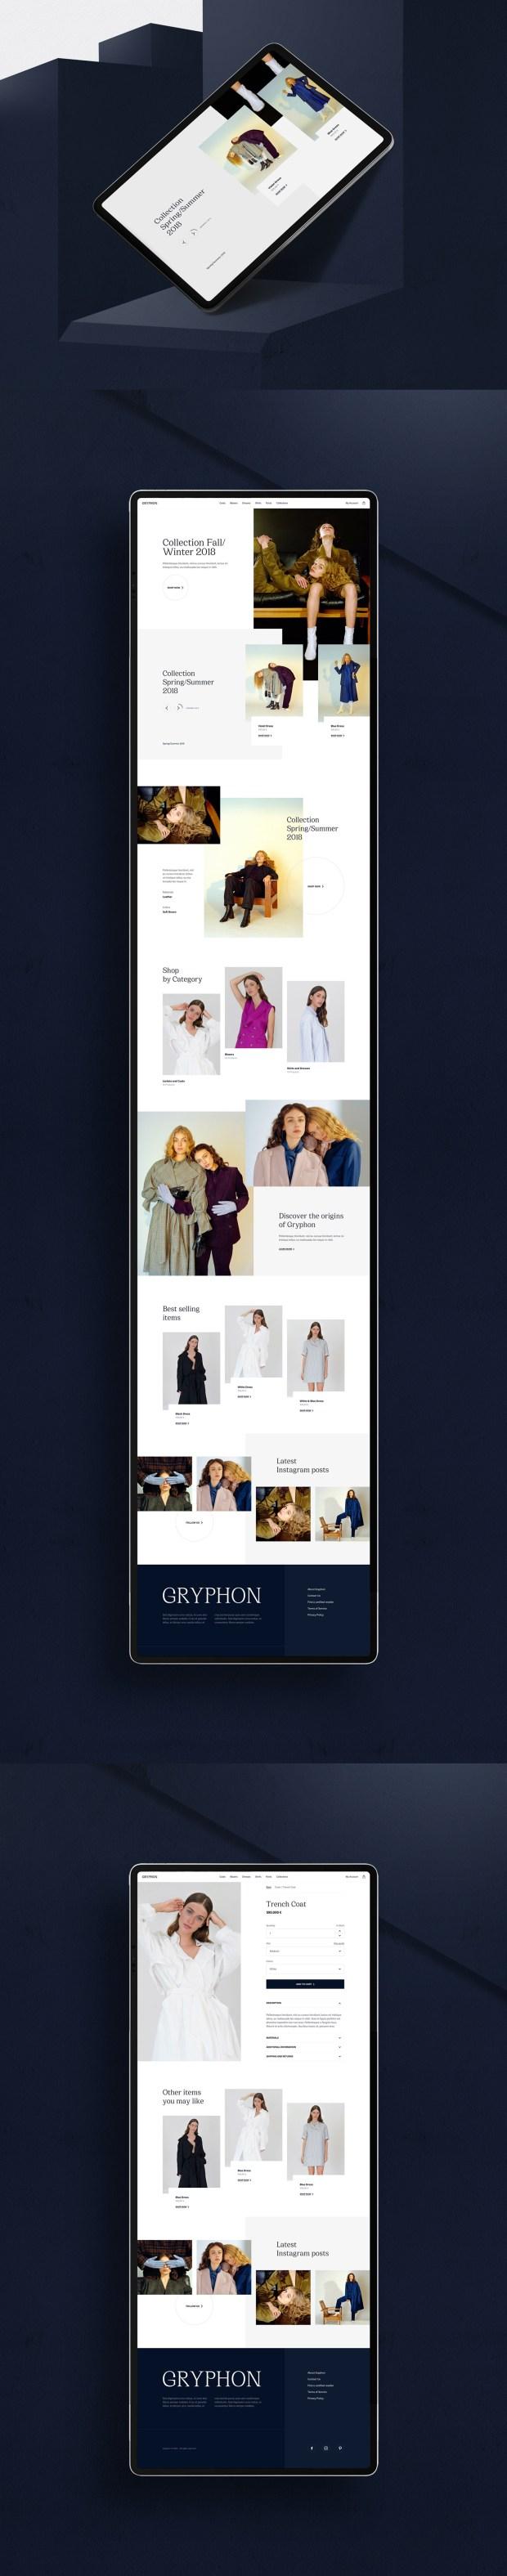 Gryphon Fashion E-commerce Template